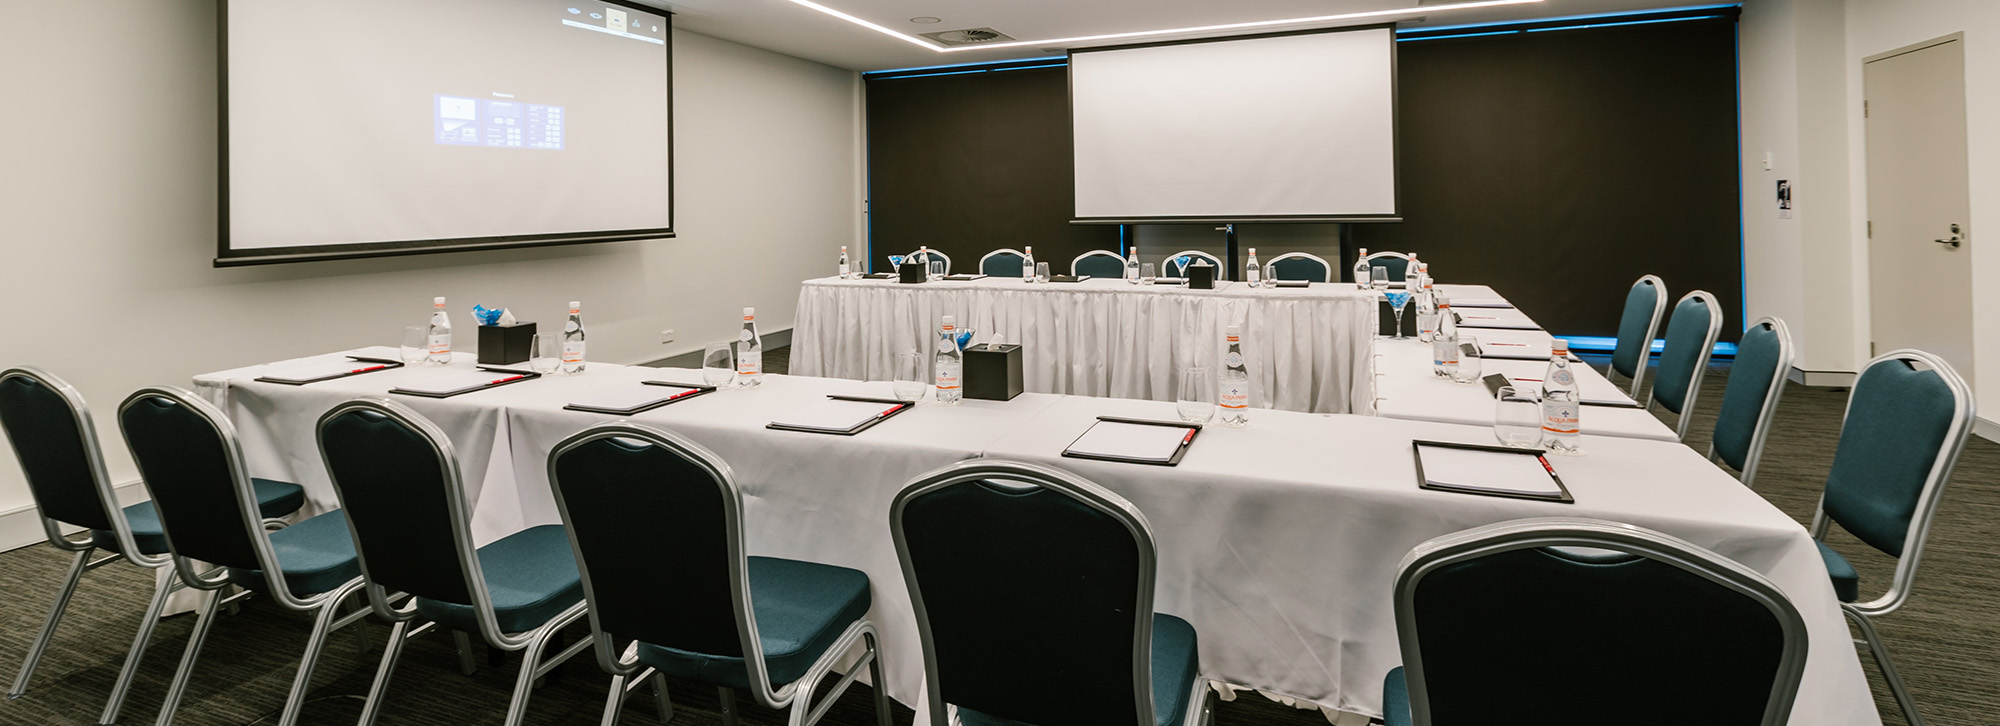 U型会议布置容纳24位宾客